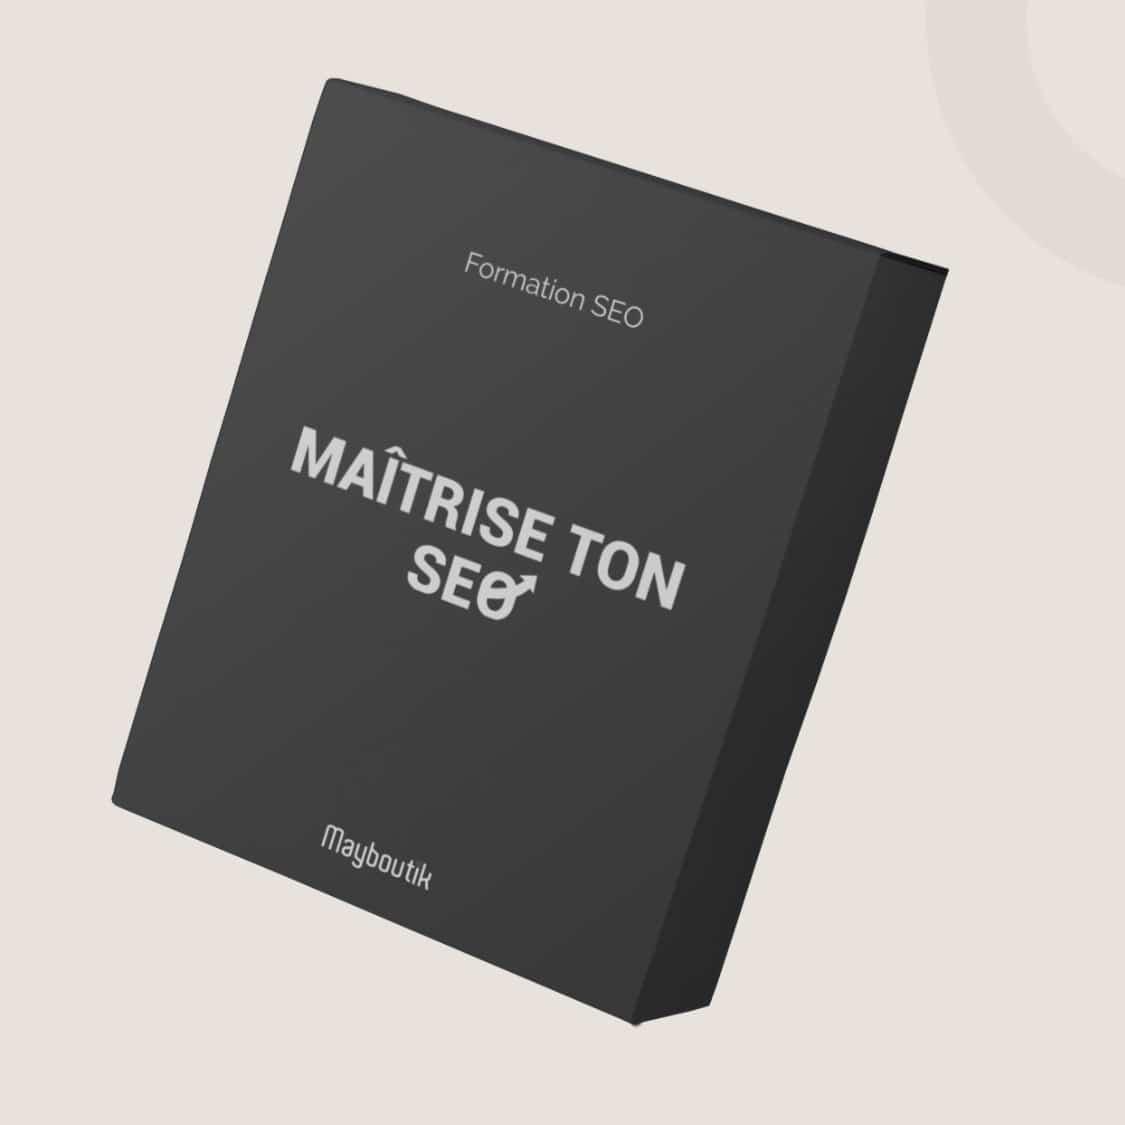 Formation Maitrise ton SEO